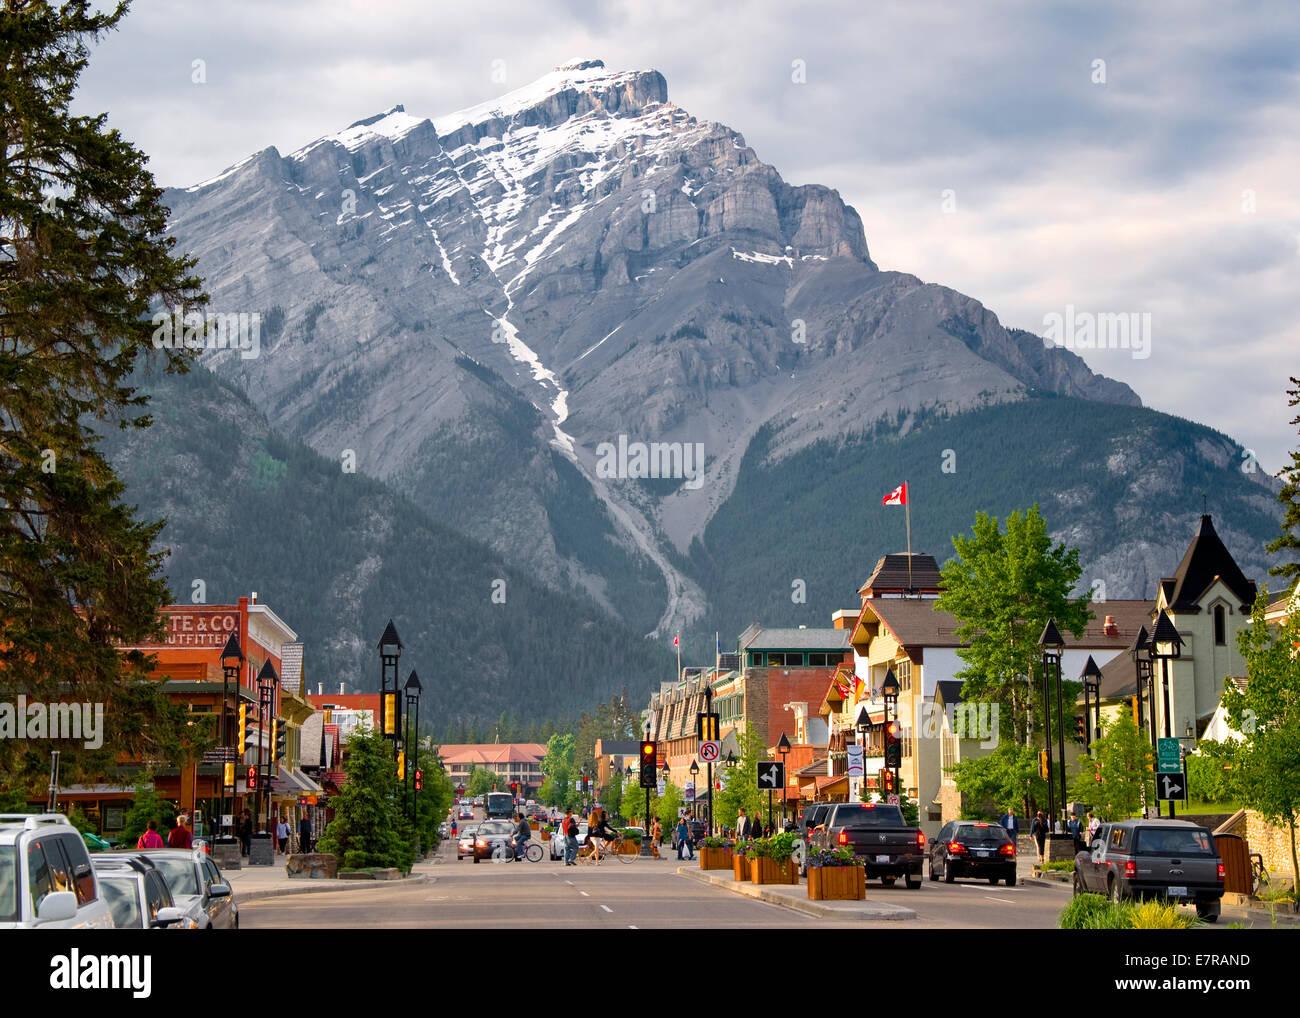 Ville de Banff, Banff, Alberta, Canada Photo Stock